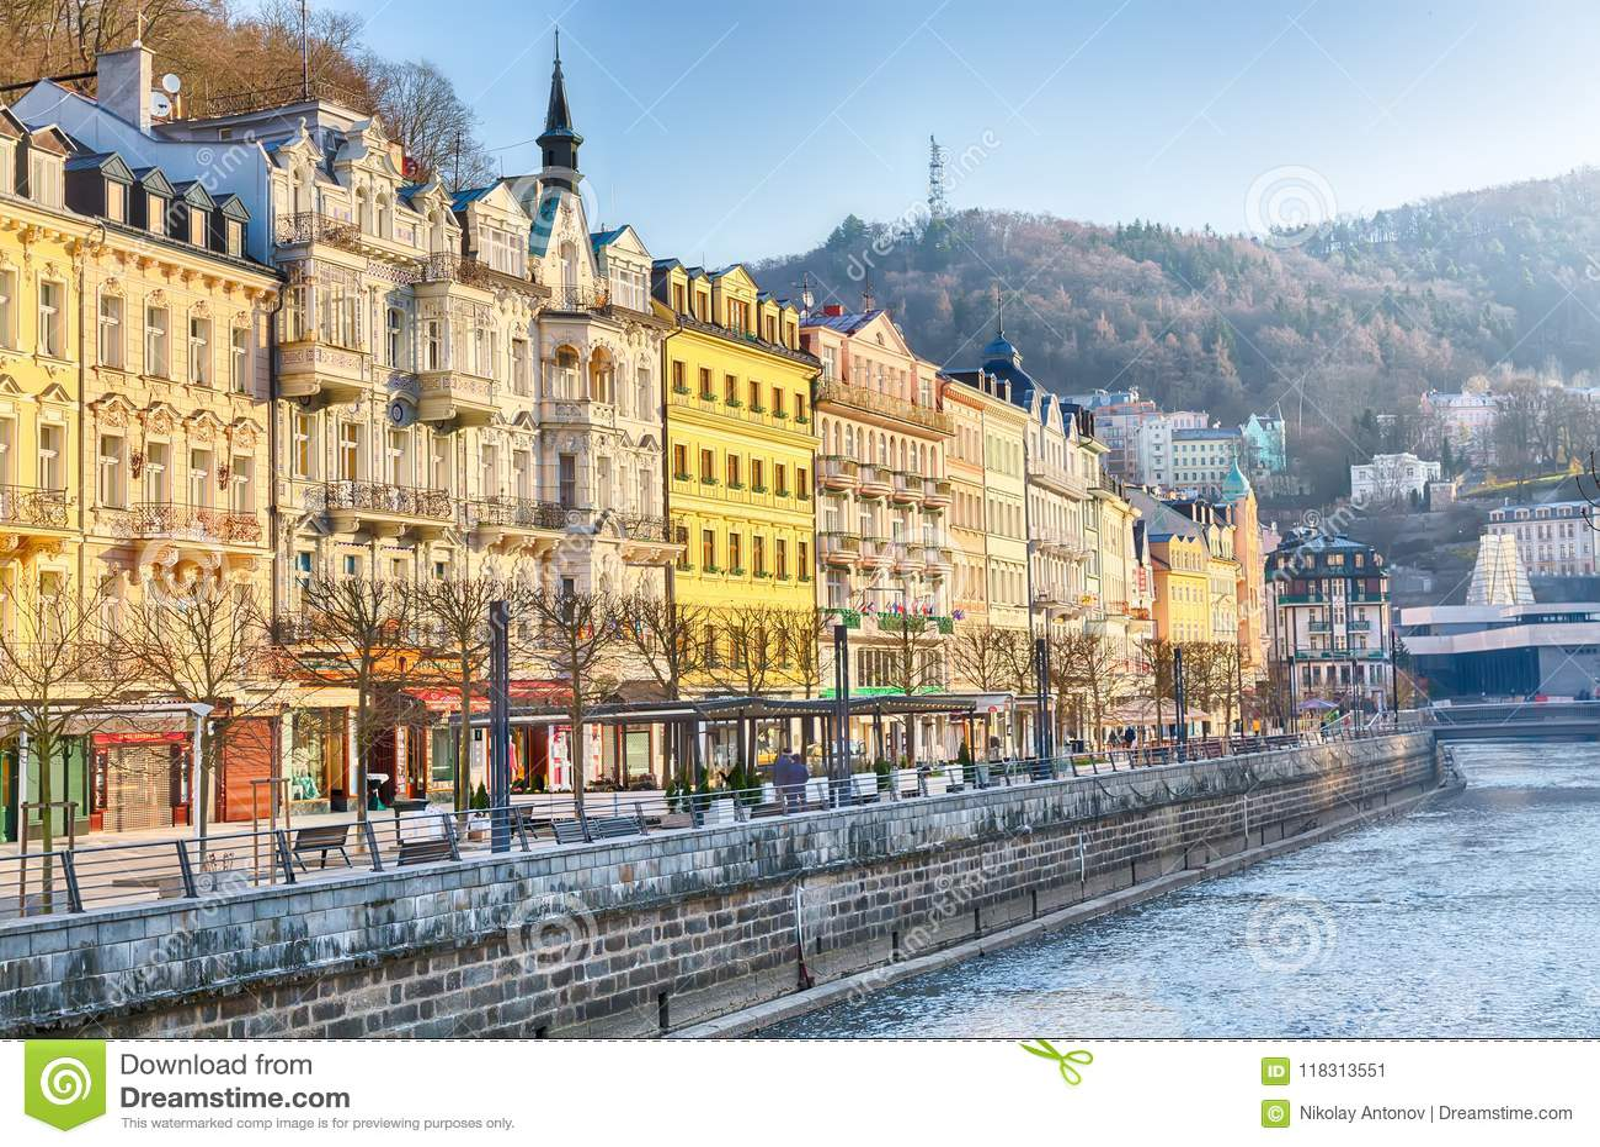 Karlovy Vary, Tschechische Republik - April 2018: Häuser im Stadtzentrum von Karlovy Vary auf dem Tepla-Fluss Karlovy Vary Karlsb